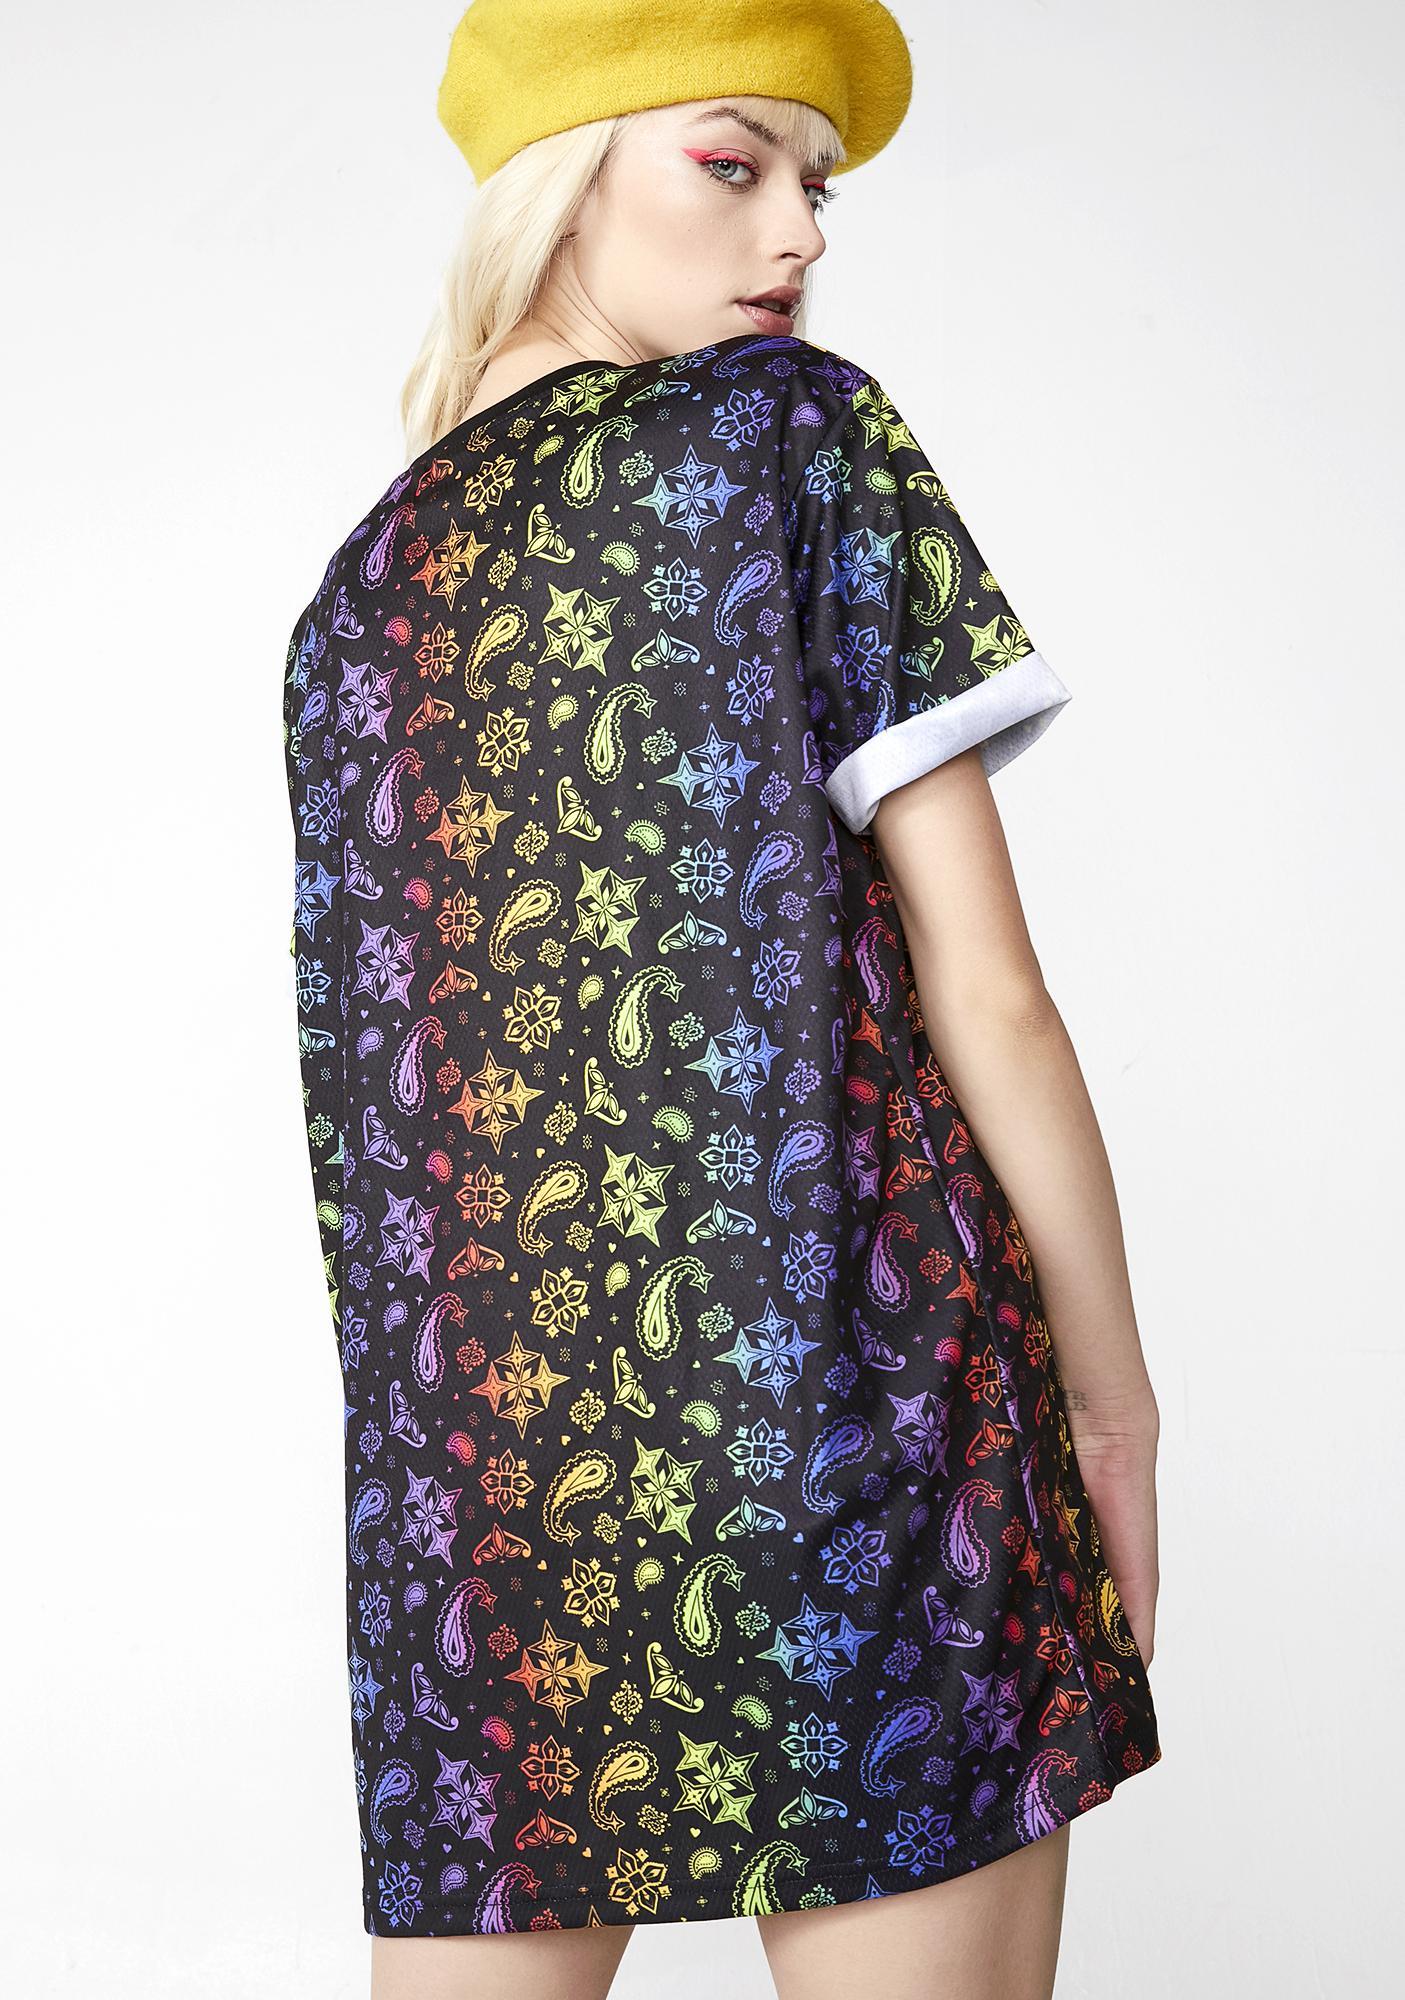 Cute Mistake Toxic T-Shirt Dress